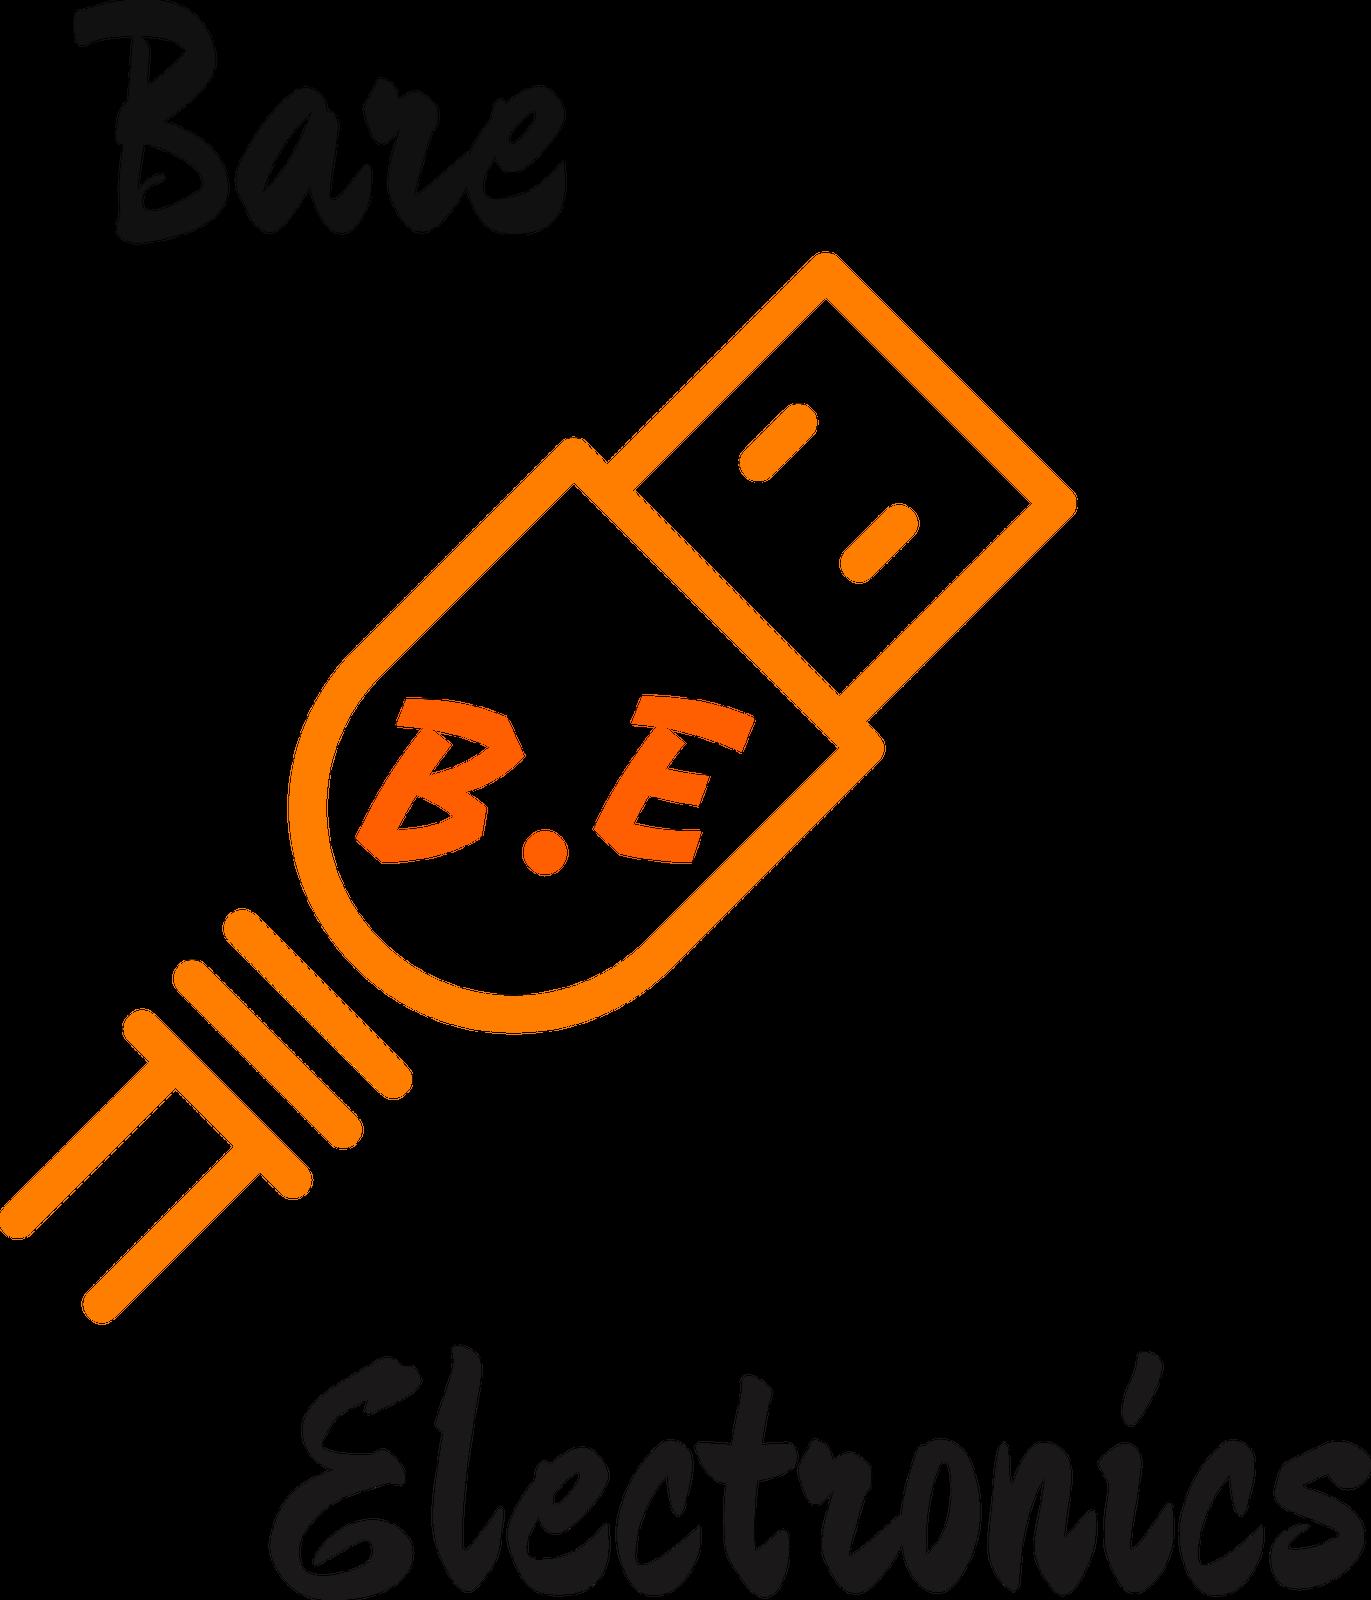 BareElectronics